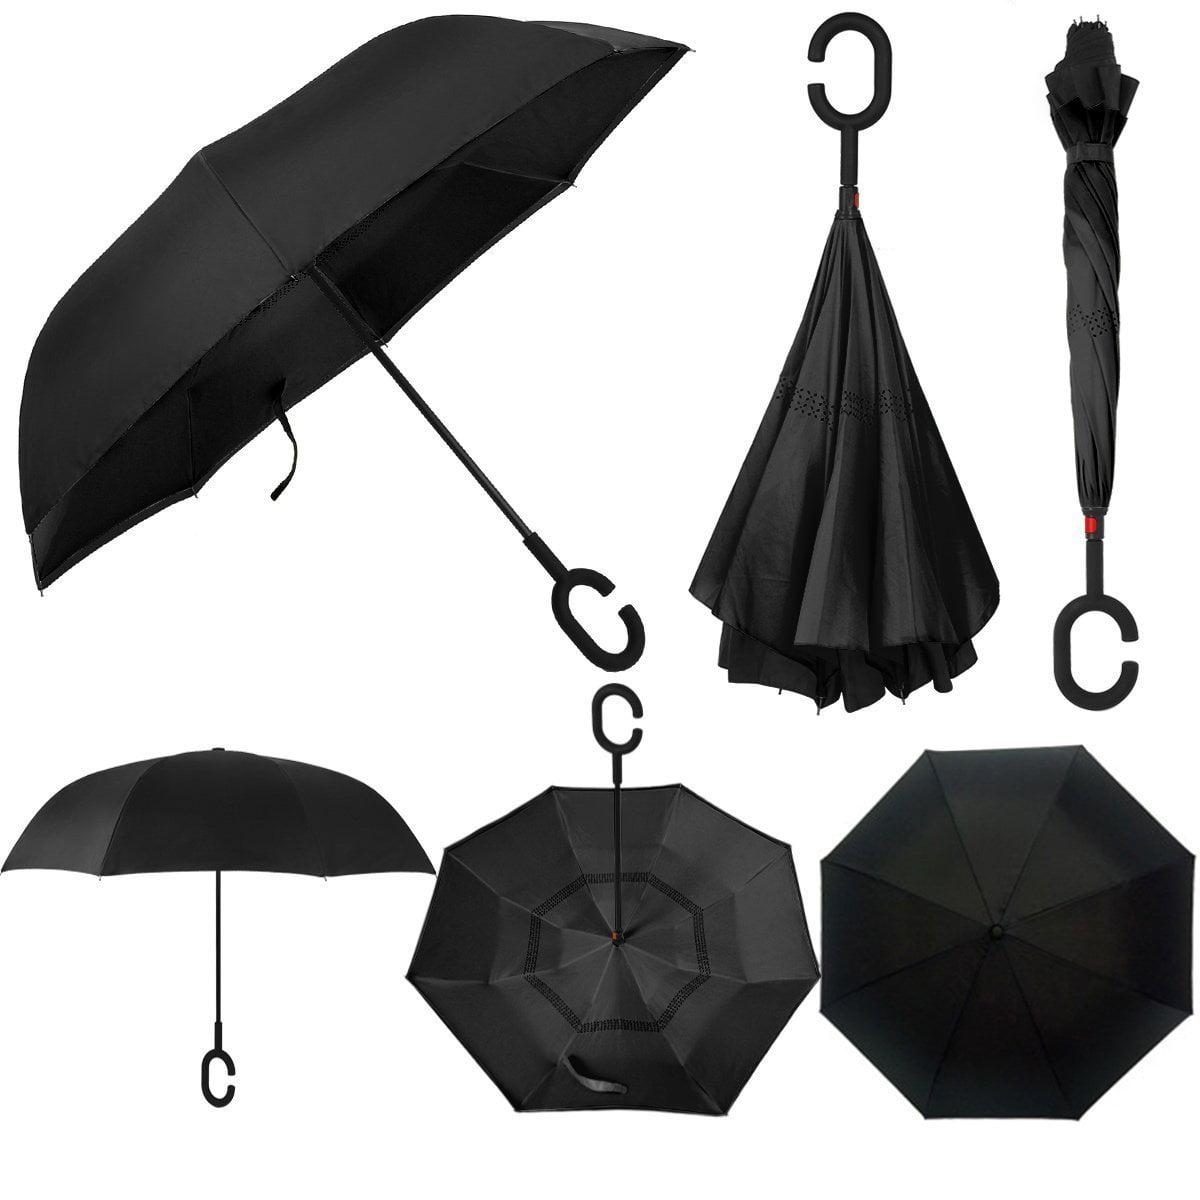 Double Layer Inverted Inverted Umbrella Is Light And Sturdy Dark Forest Gloomy Scene Trees Big Reverse Umbrella And Windproof Umbrella Edge Night Ref